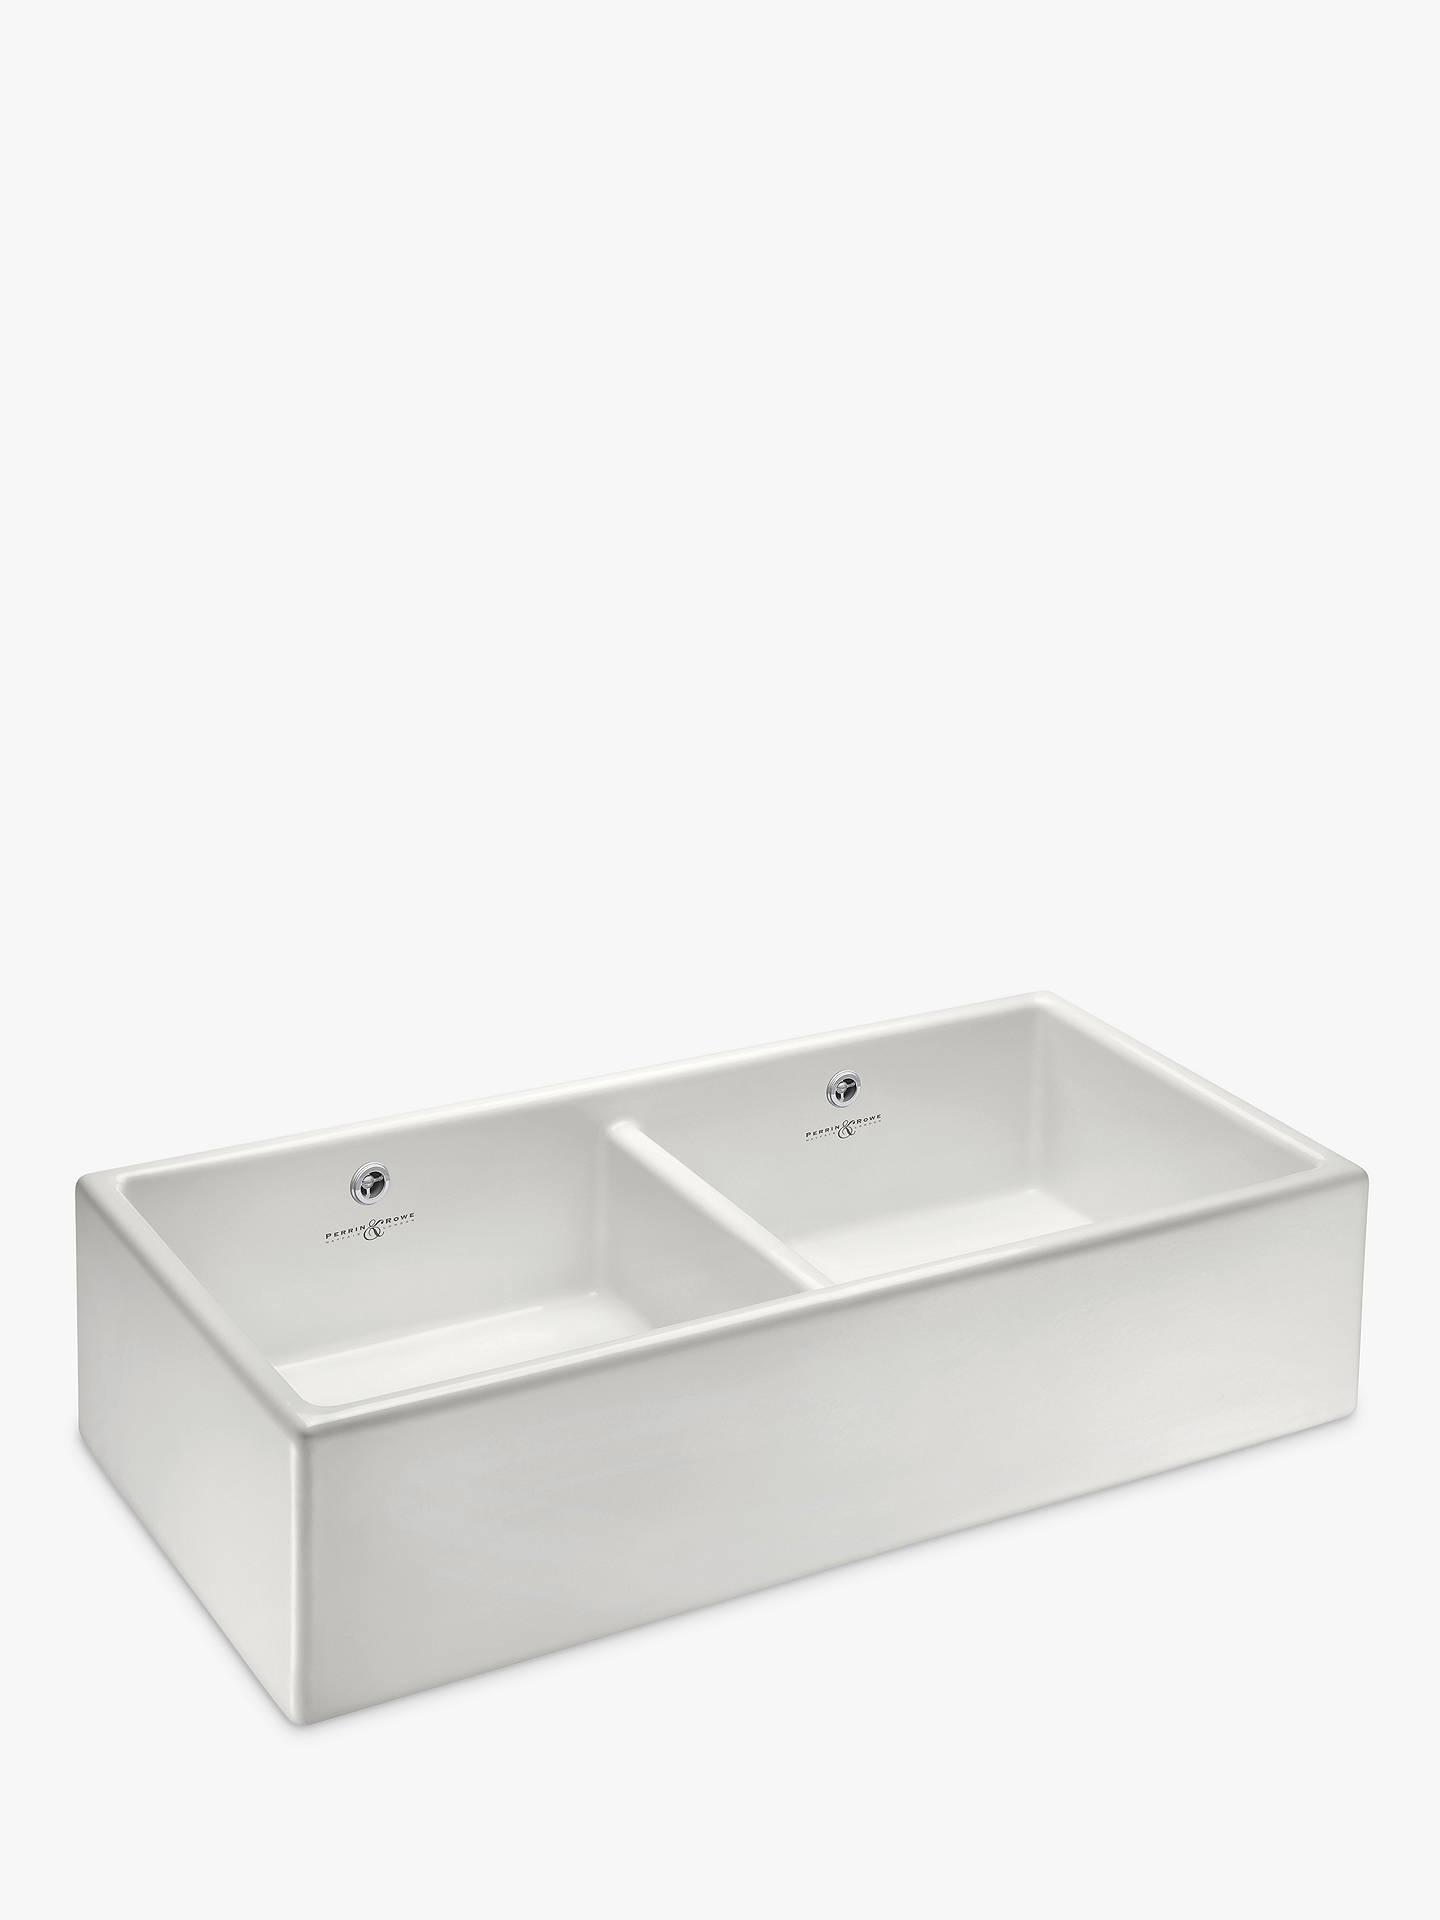 Perrin Rowe Shaker 1000 2 Bowl Farmhouse Ceramic Kitchen Sink White